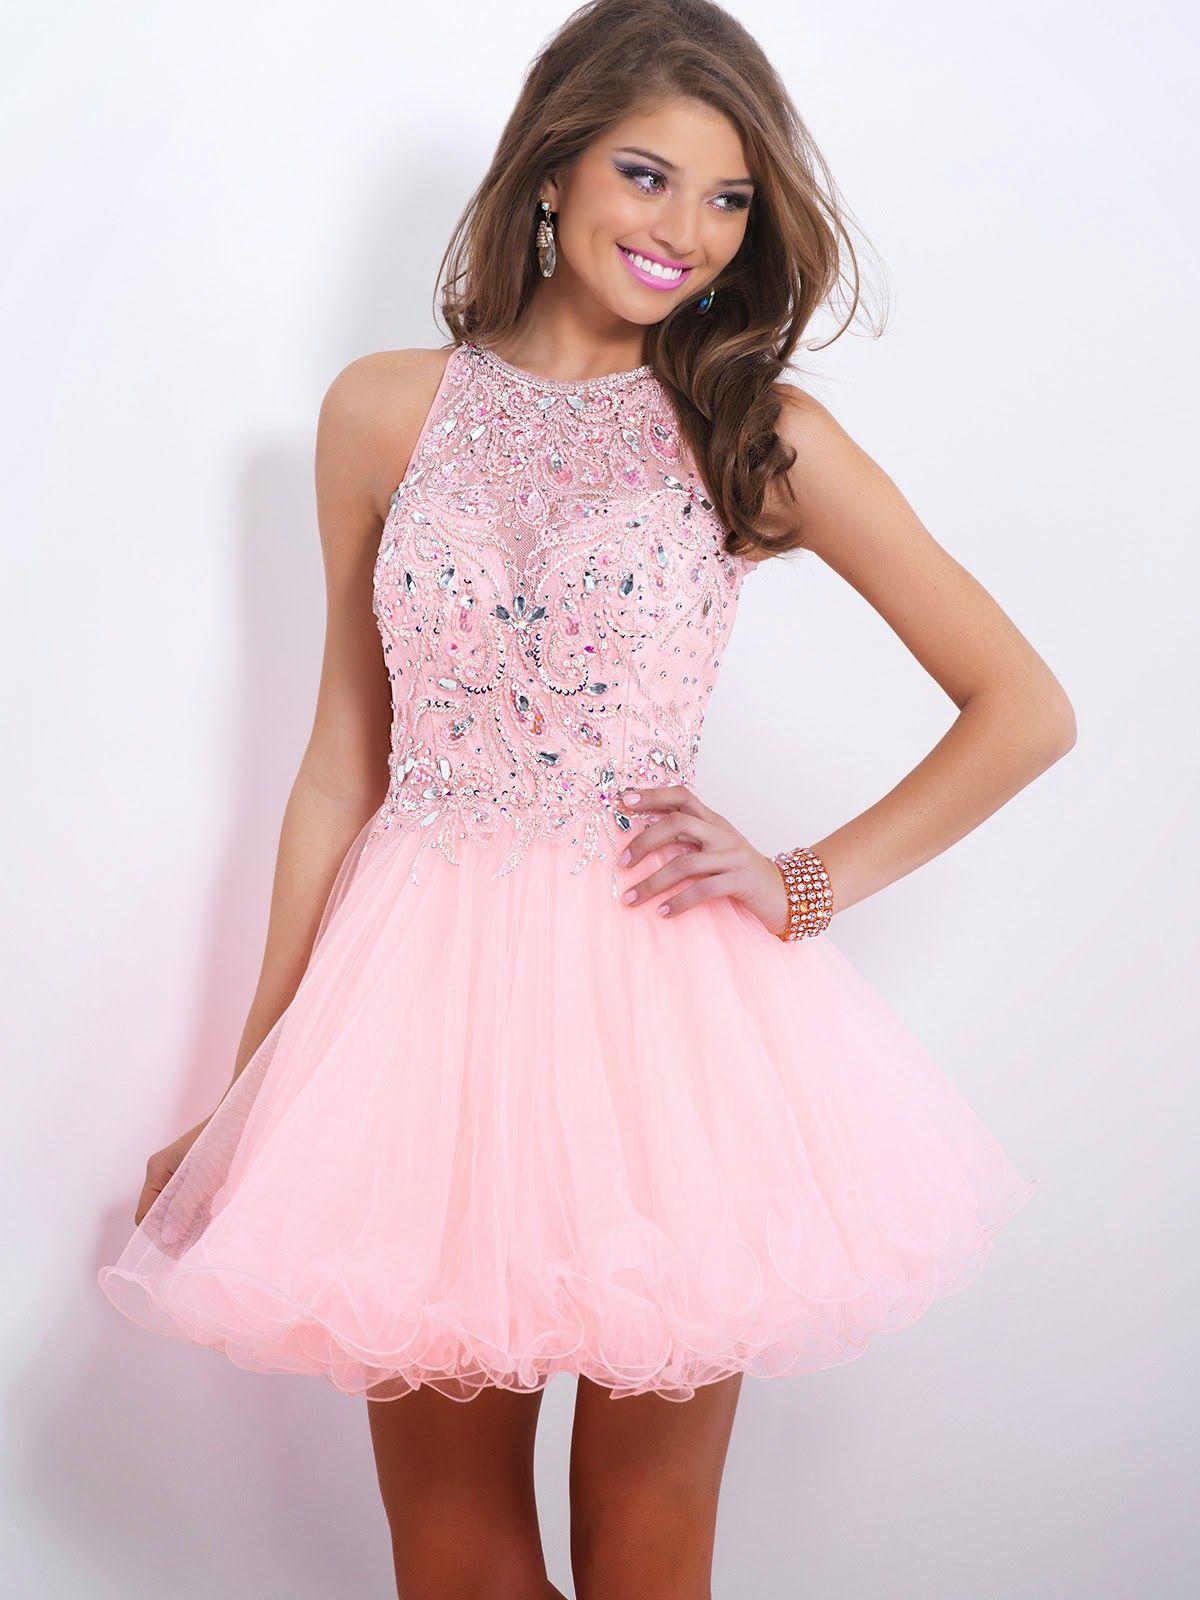 vestido para adolescentes 2015 - Buscar con Google | fashion & style ...